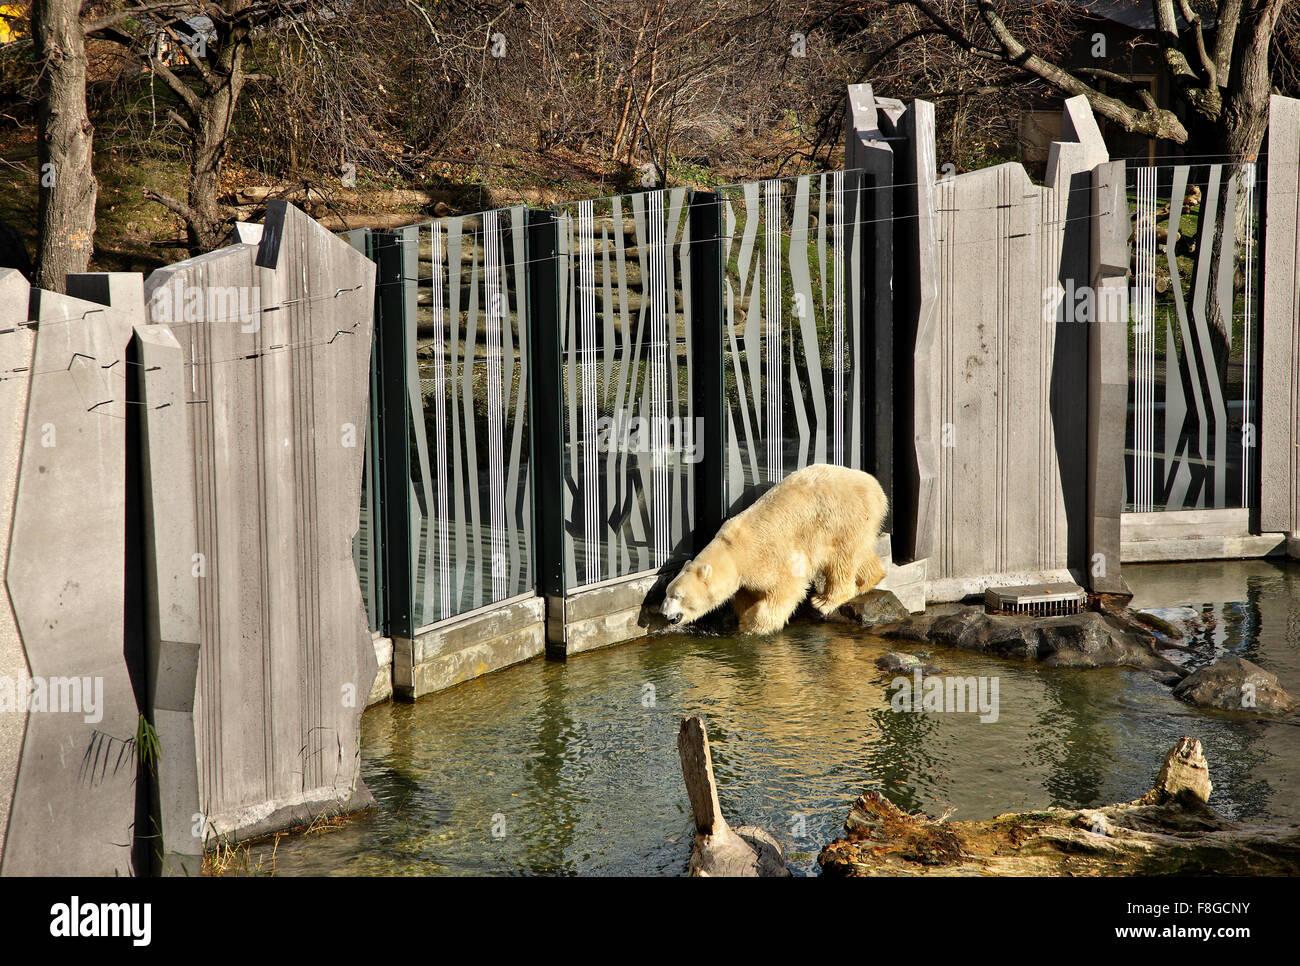 Polar Bear In The Zoo Tiergarden Of Schonbrunn Palace Vienna